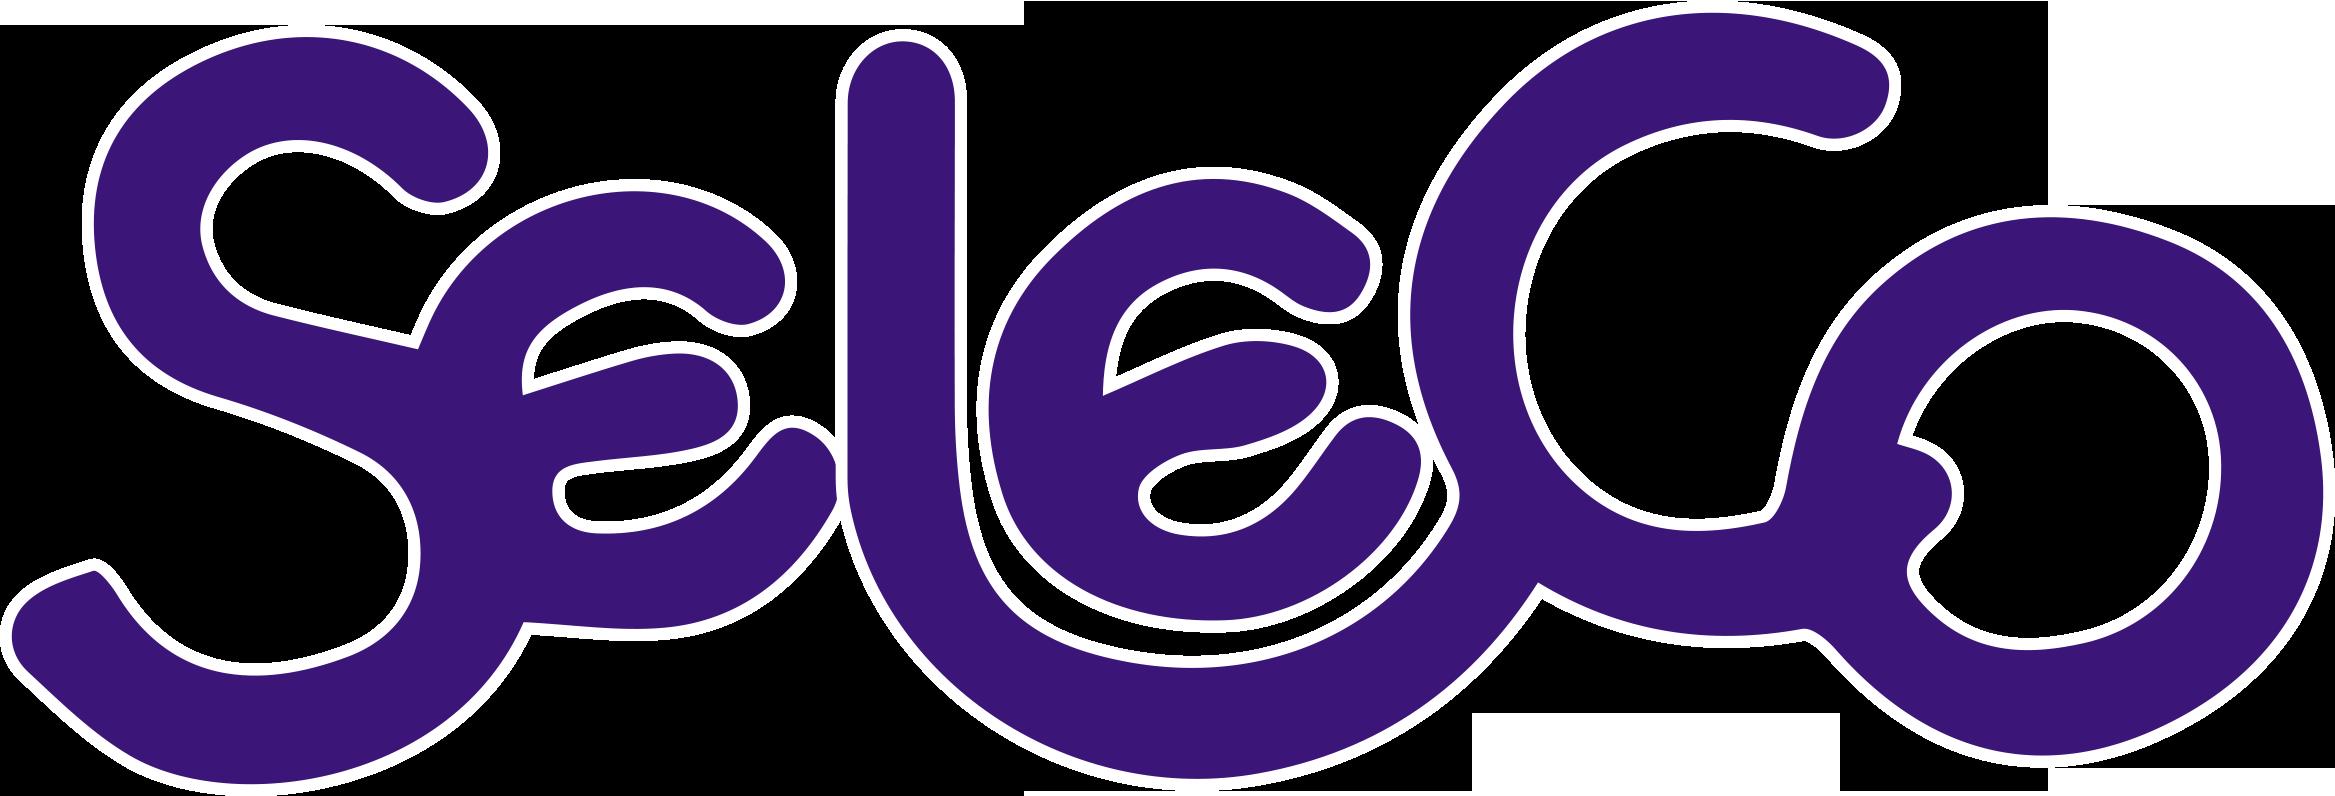 Brands hoya marketing technology. Purple clipart seaweed